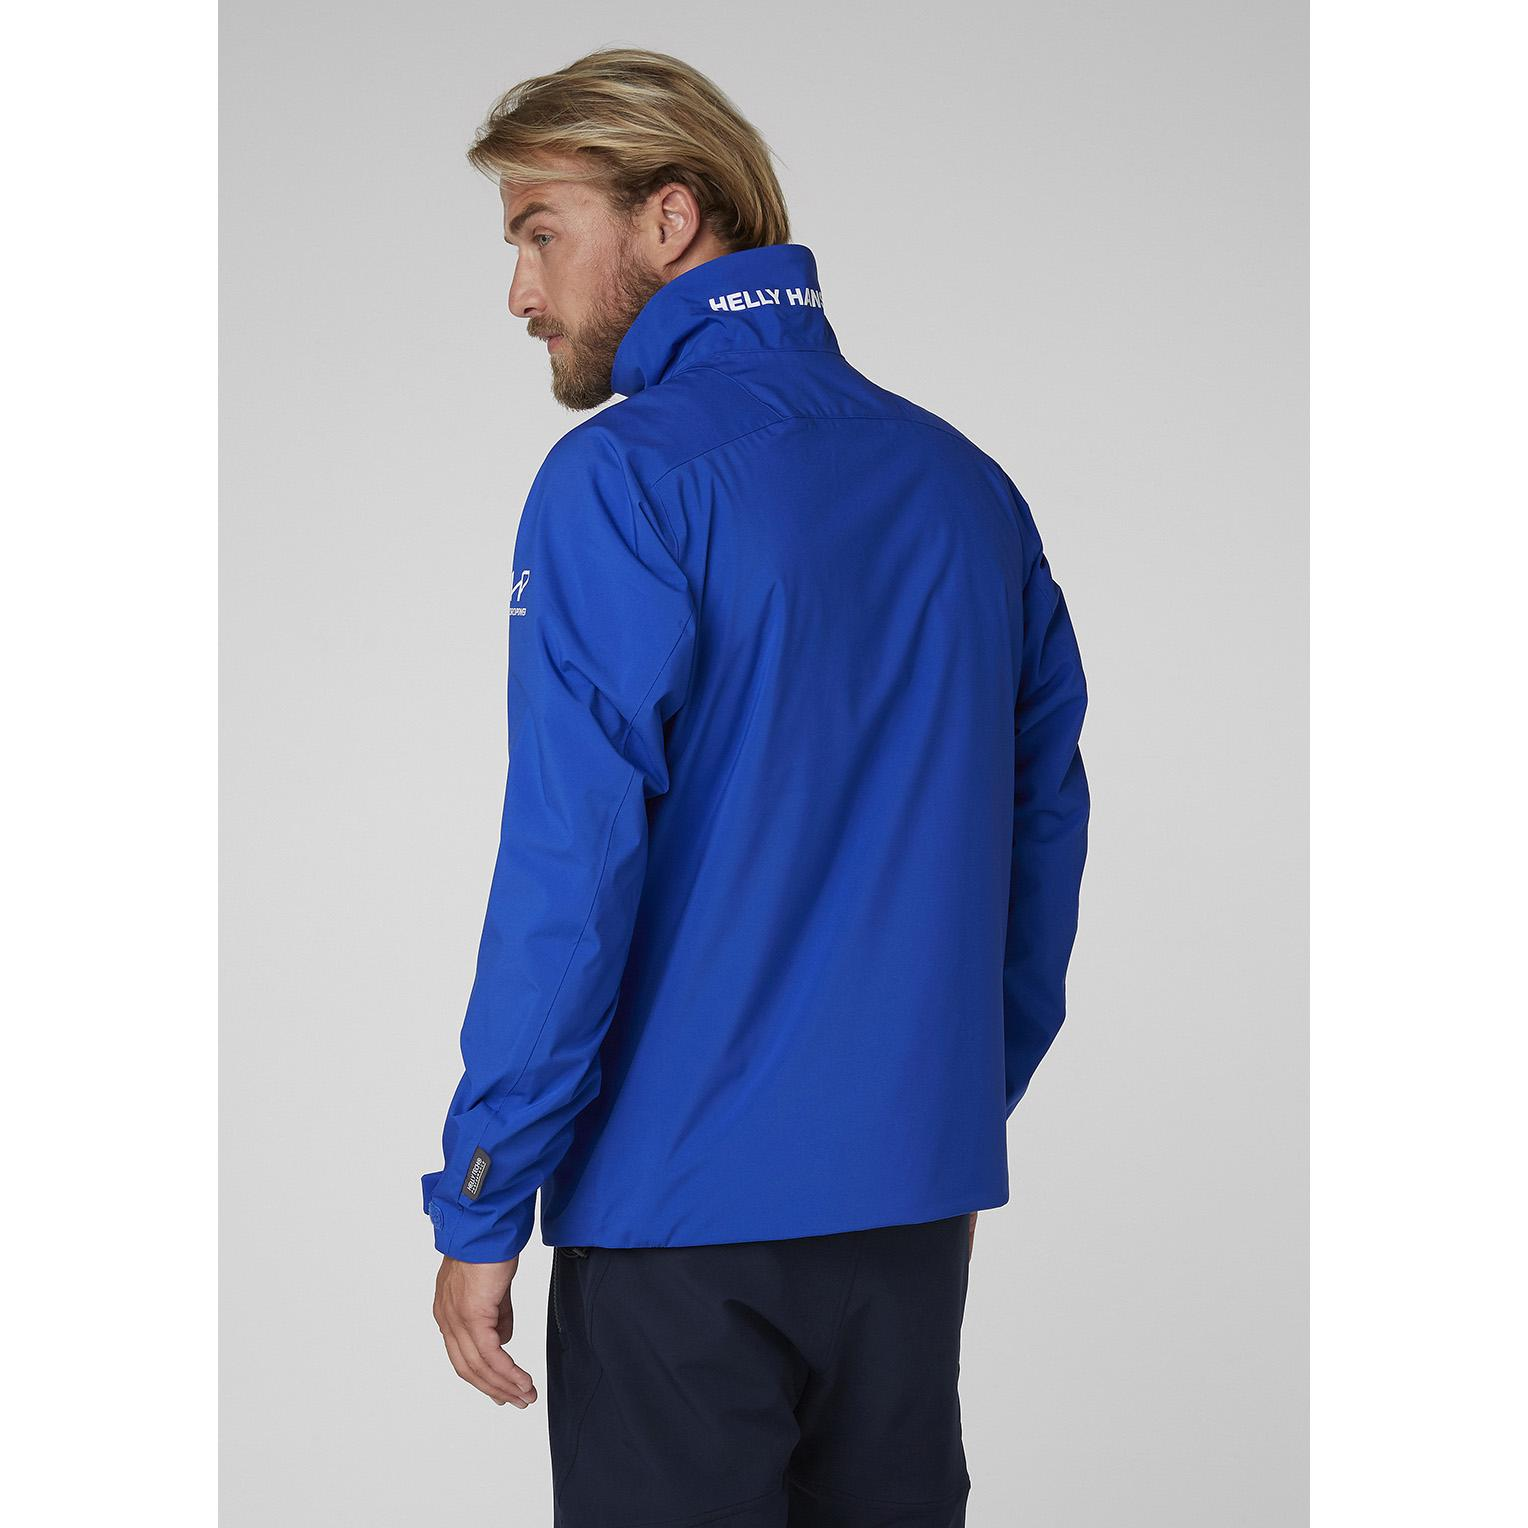 784cae4e50 ... Hp Racing Midlayer Jacket for Men - Lyst. View fullscreen